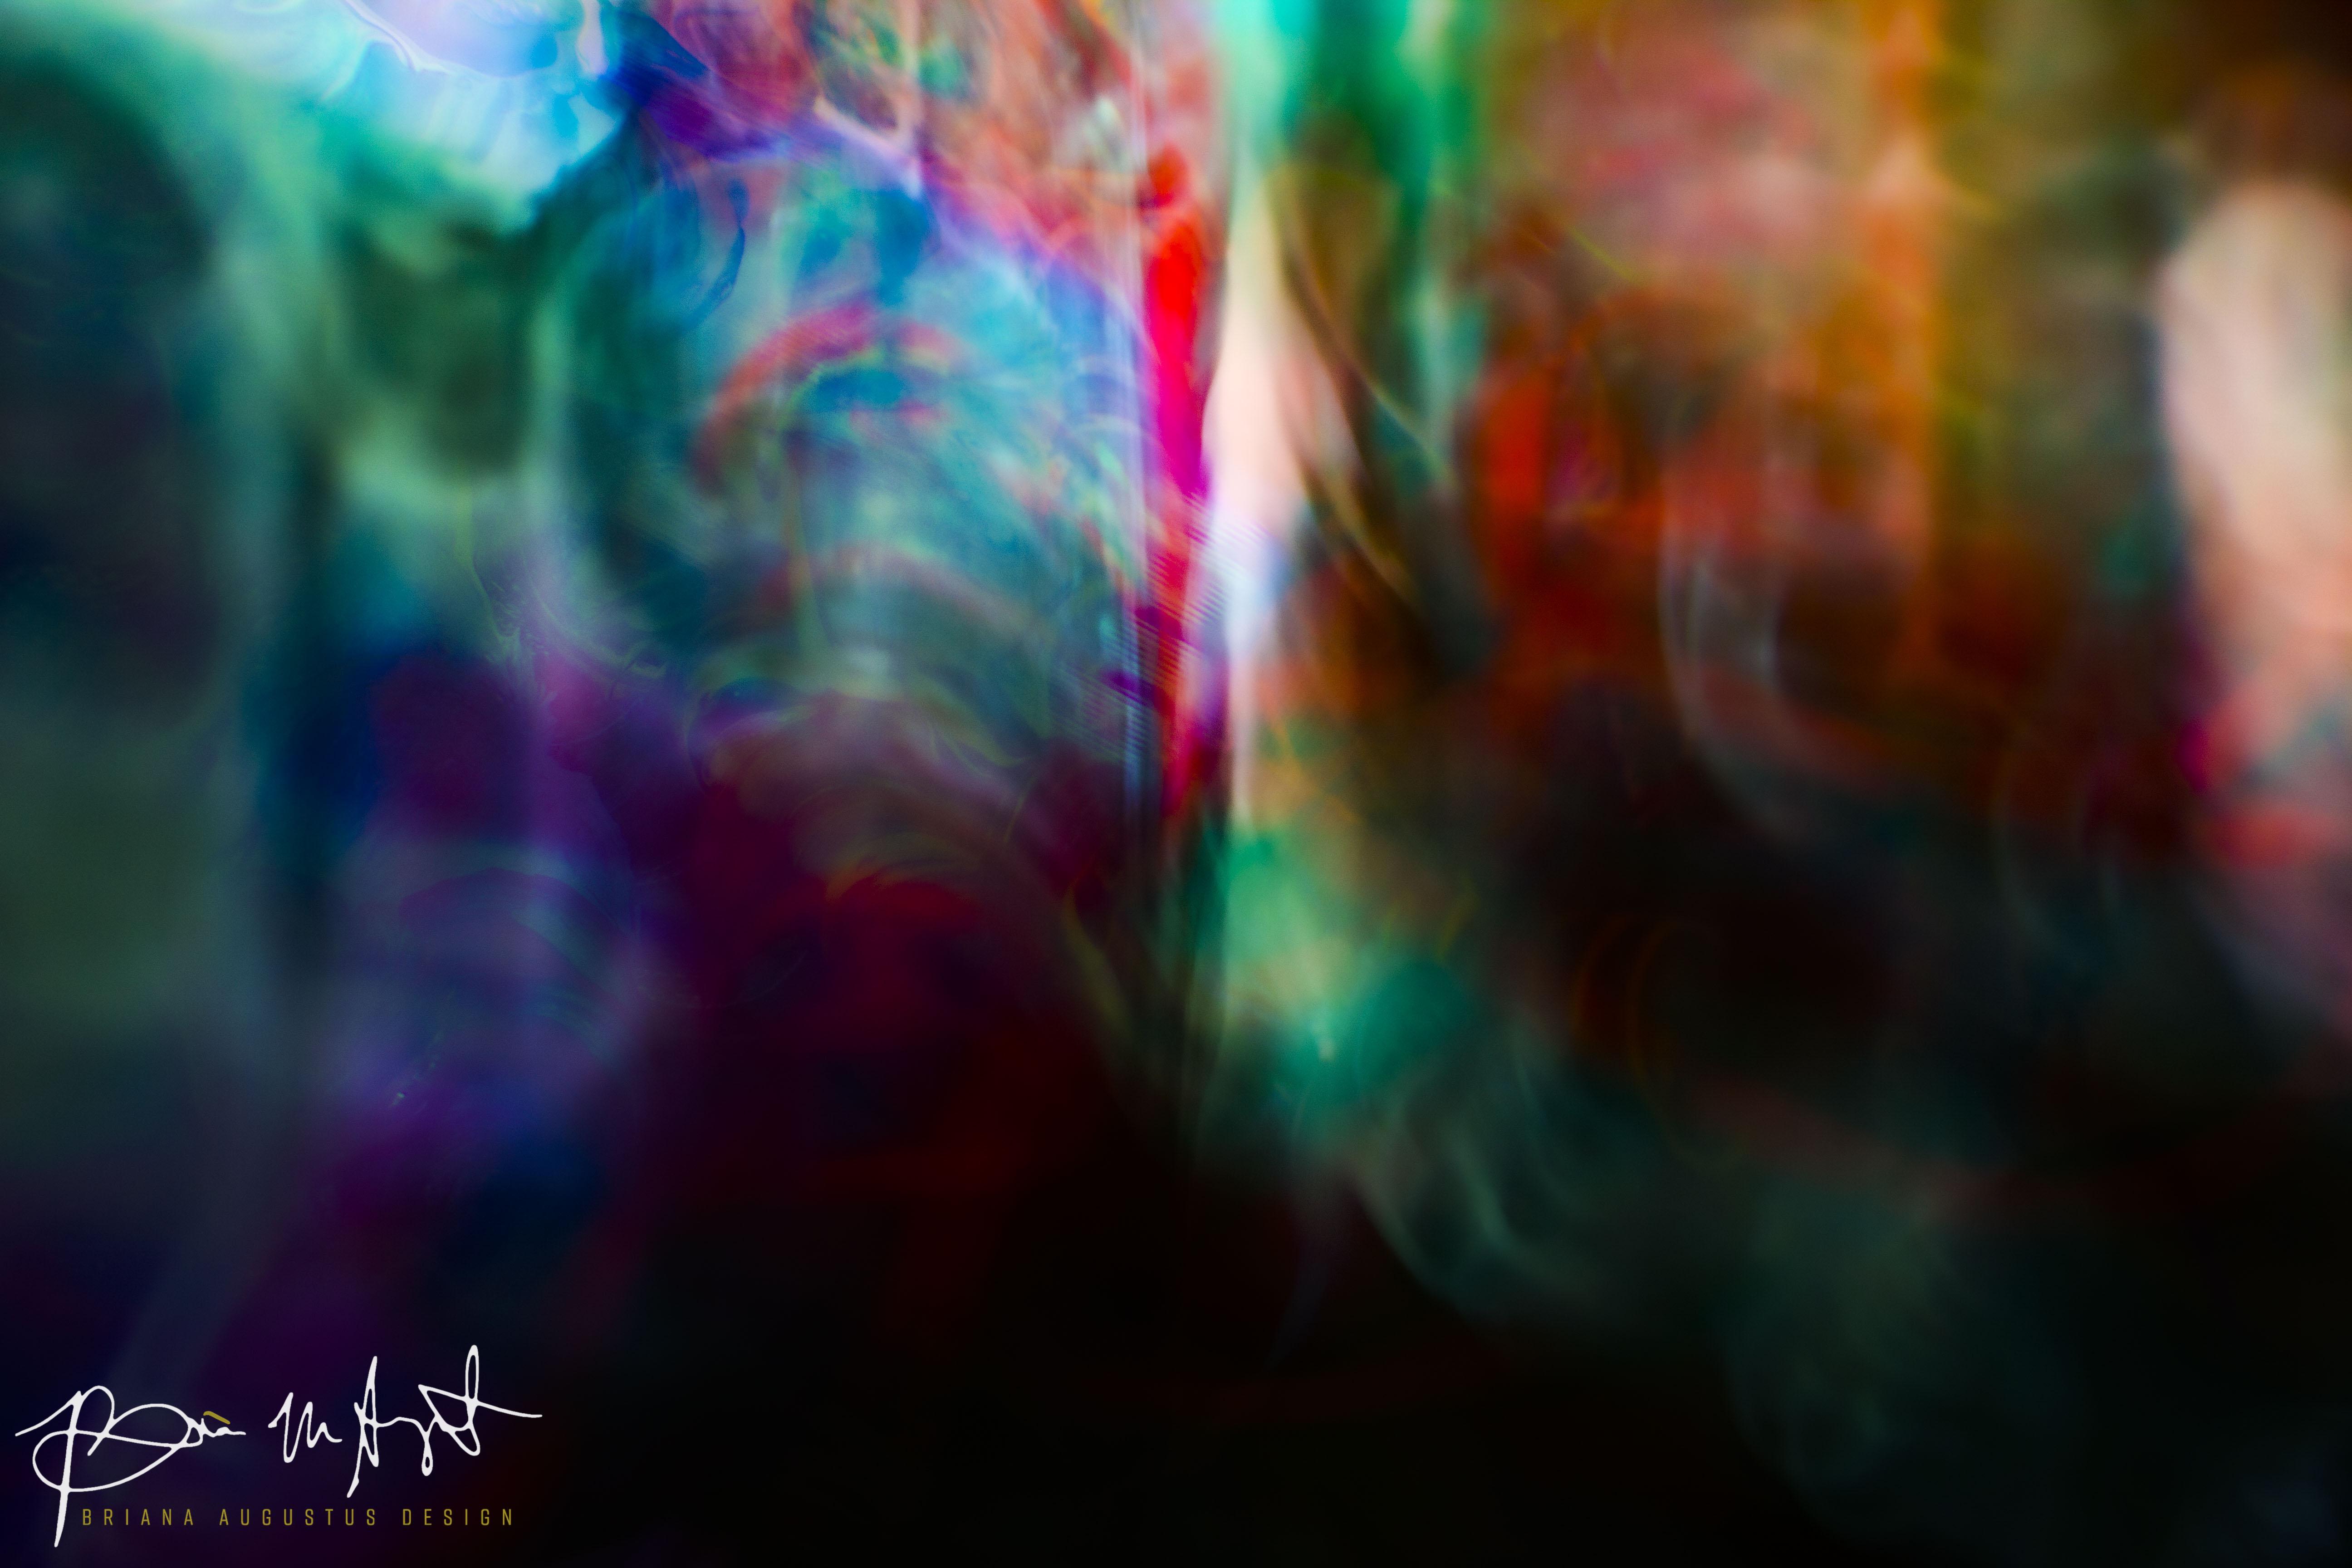 ACRYLIC_3_PRST_Acrylic_(RENAMED Art melts heart)_1a_WATERMARKED